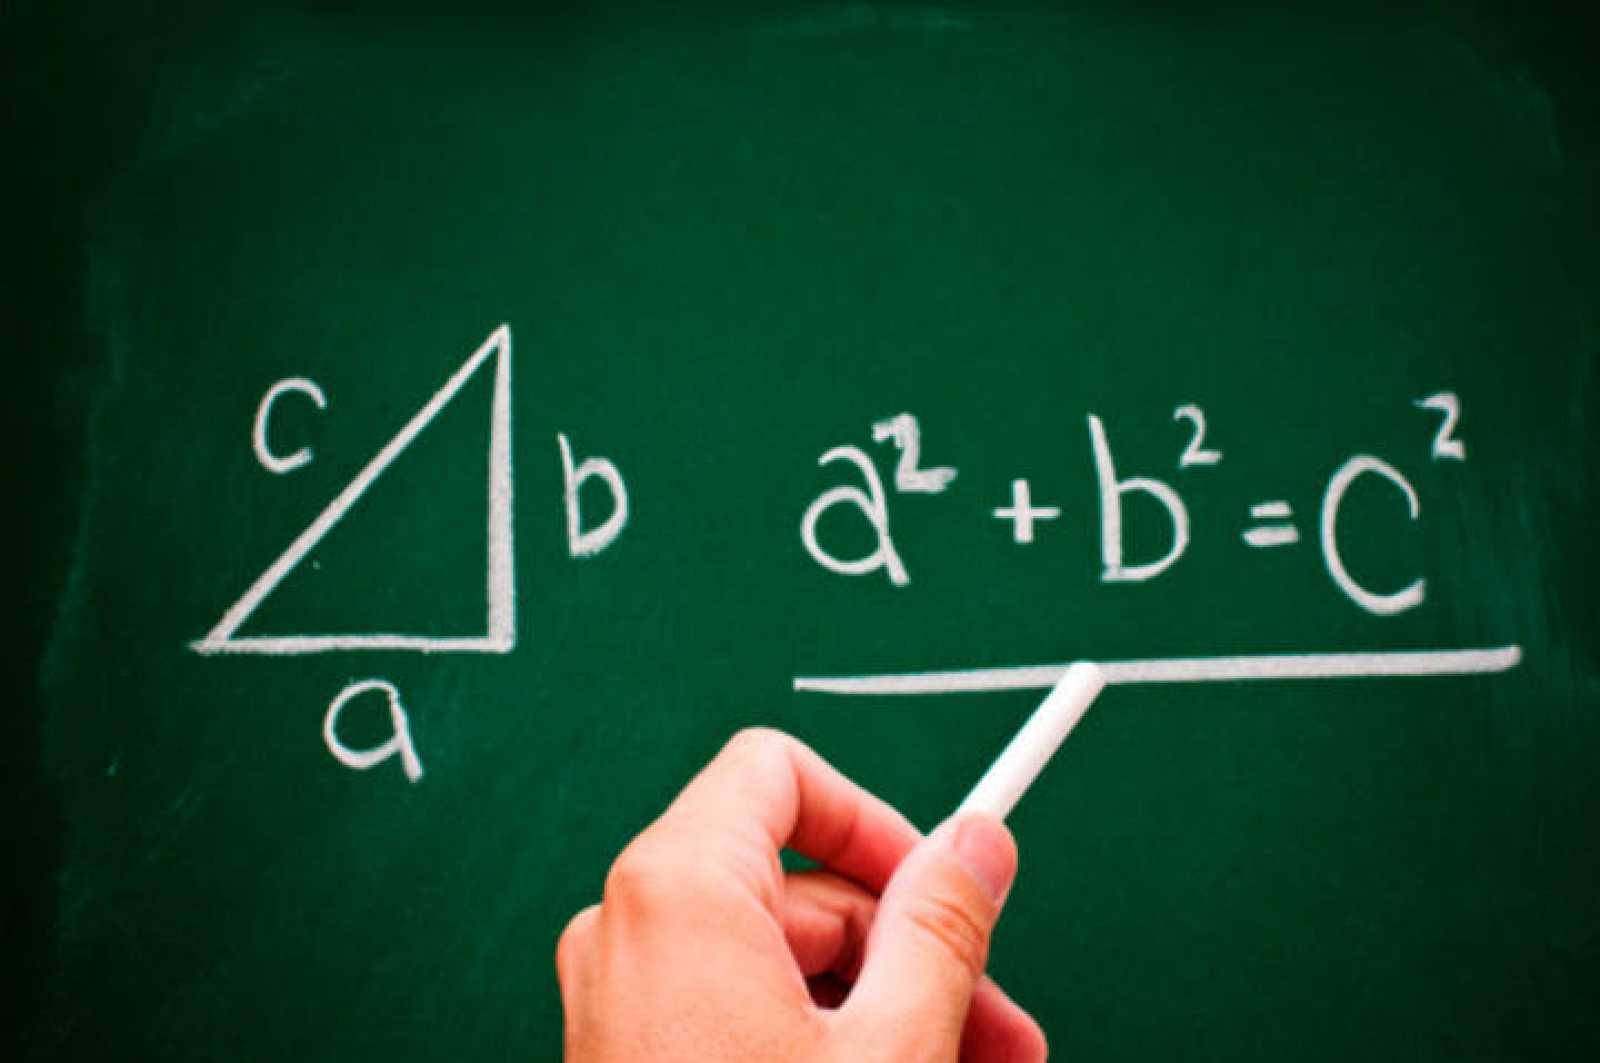 1: (Matemáticas primera sesión)